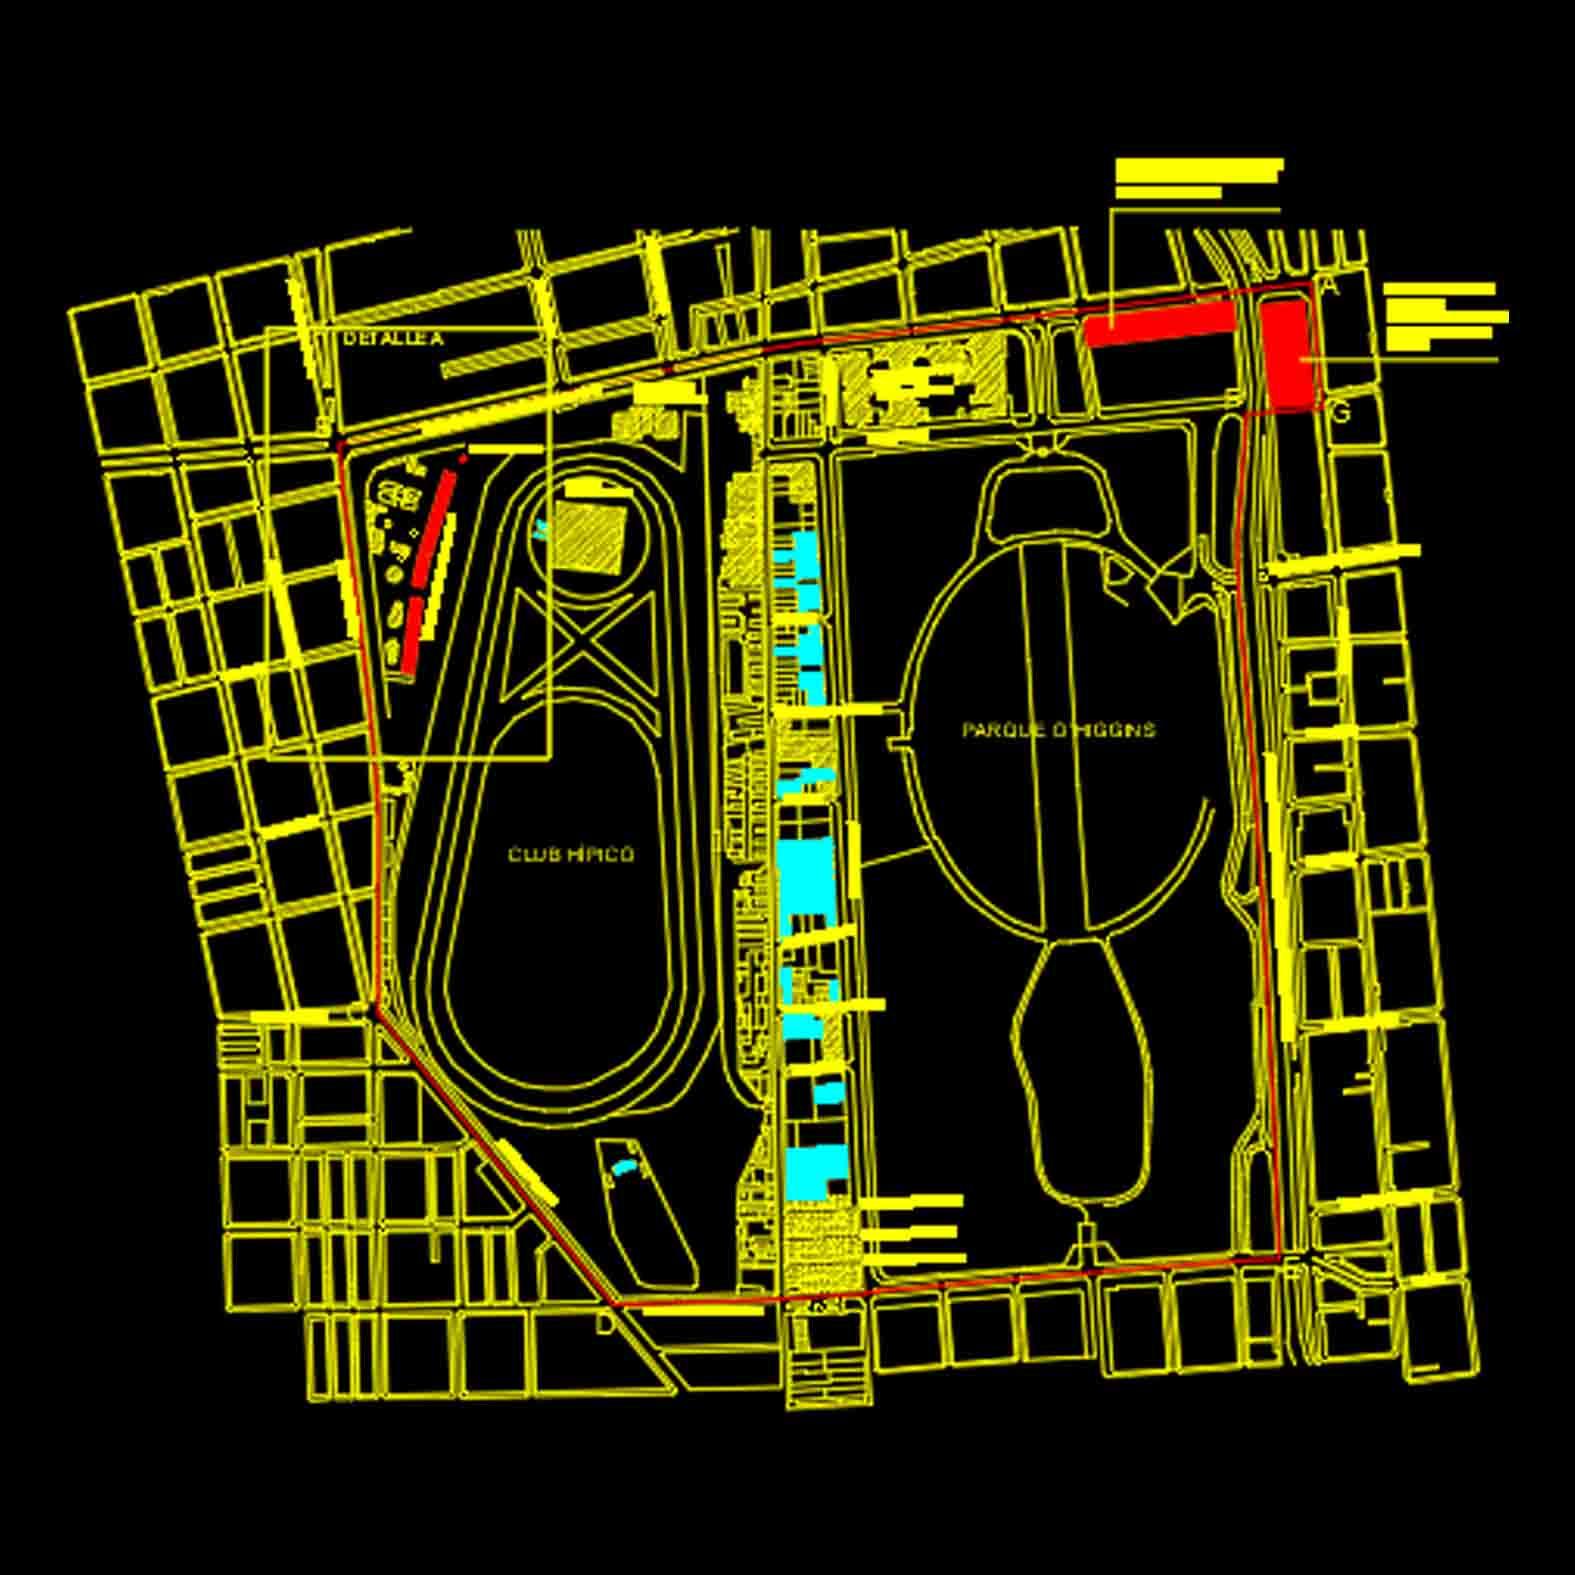 Plano: Barrio Club Hípico / Santiago